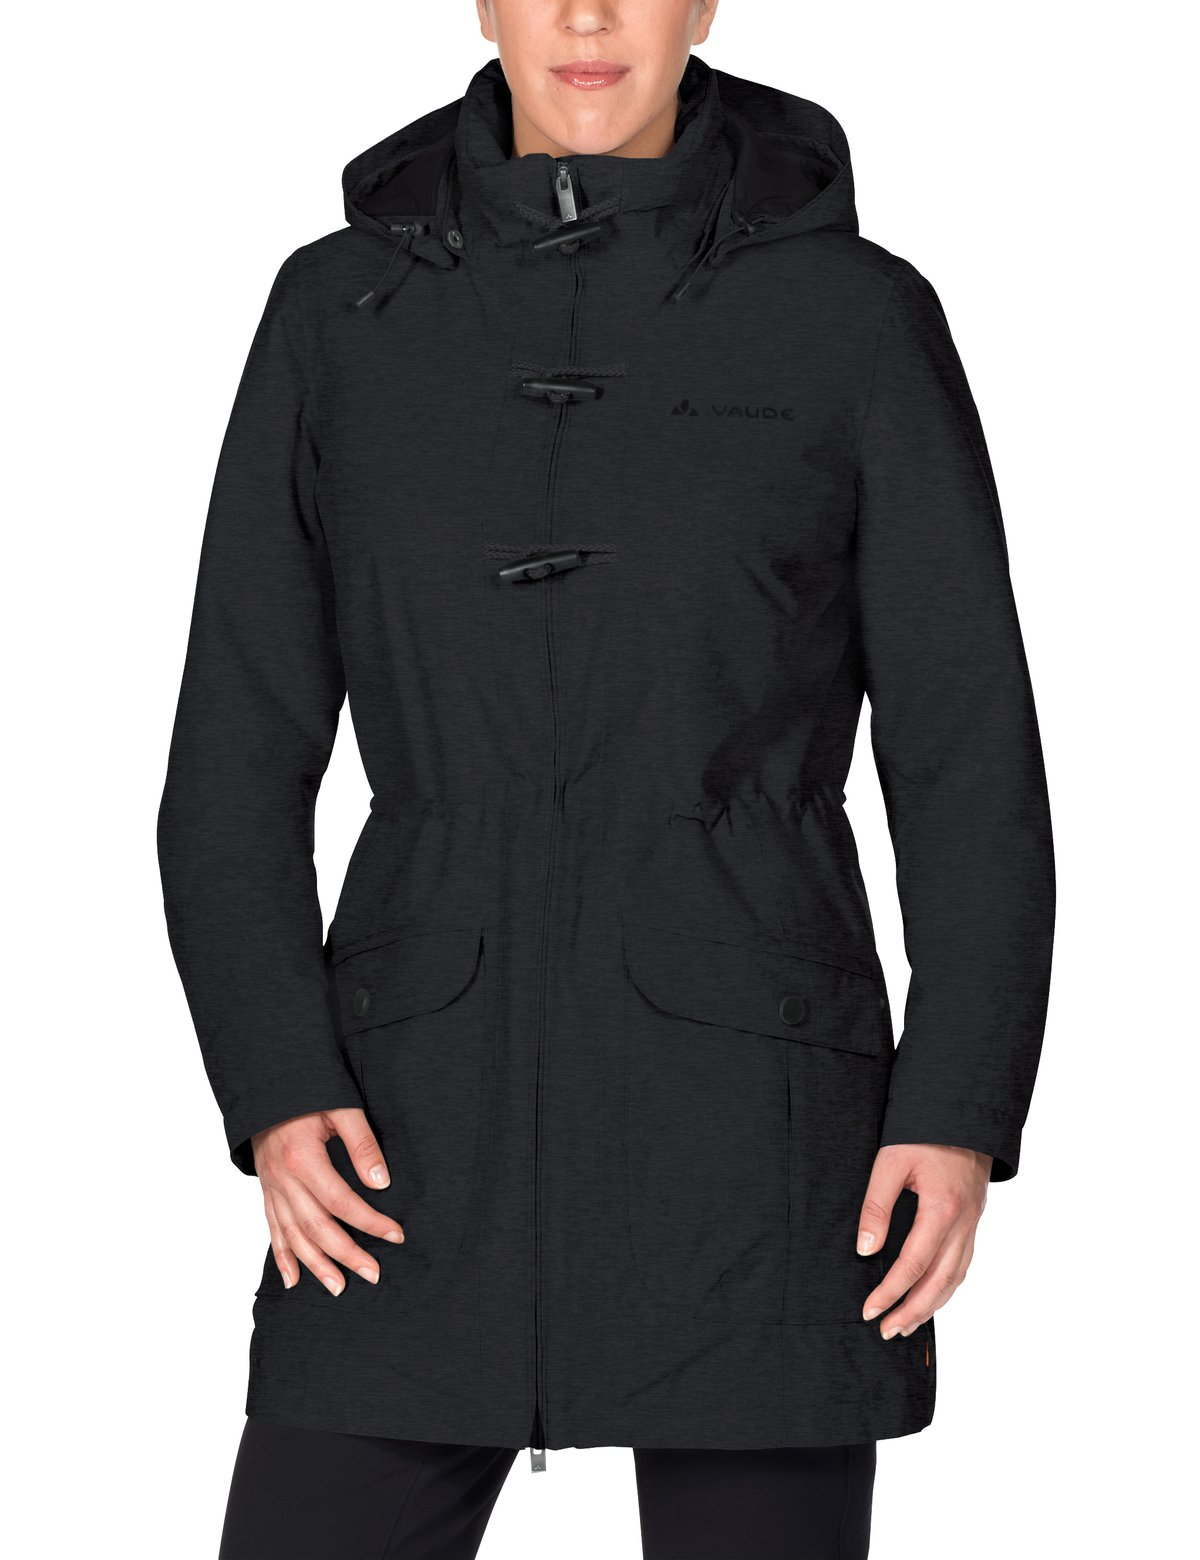 715sm6V  PL - VAUDE Women's Ceduna Coat Jacket